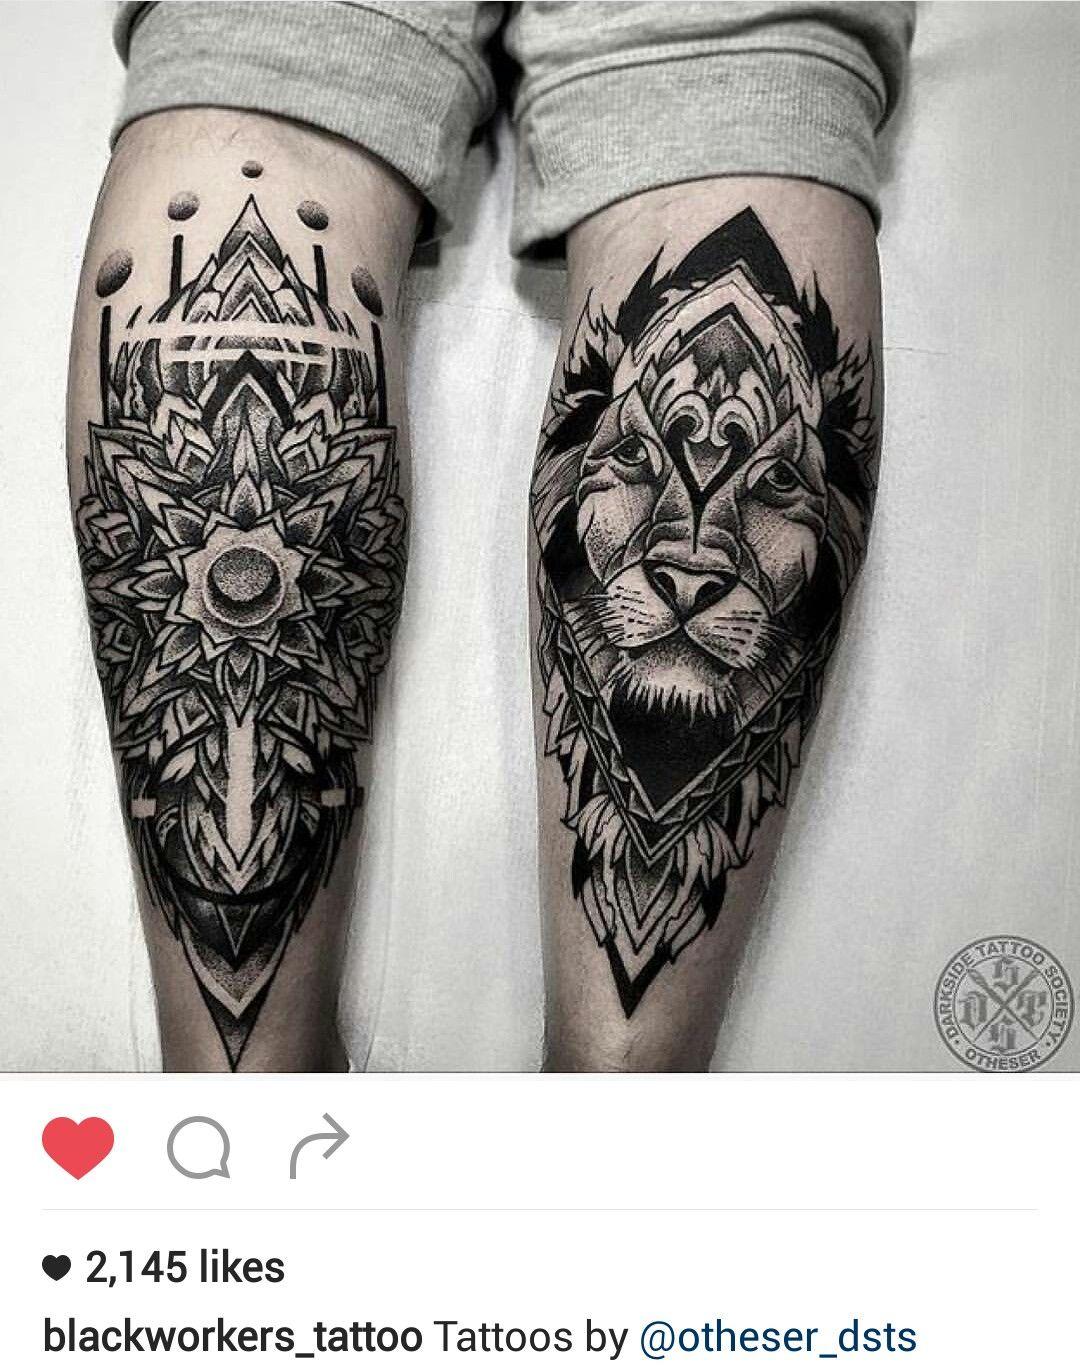 Black And Gray Mandala And Lion Tattoo By Otheser Dsts Tatuagens Geometricas Tatuagens Tatuagem Masculina Braco